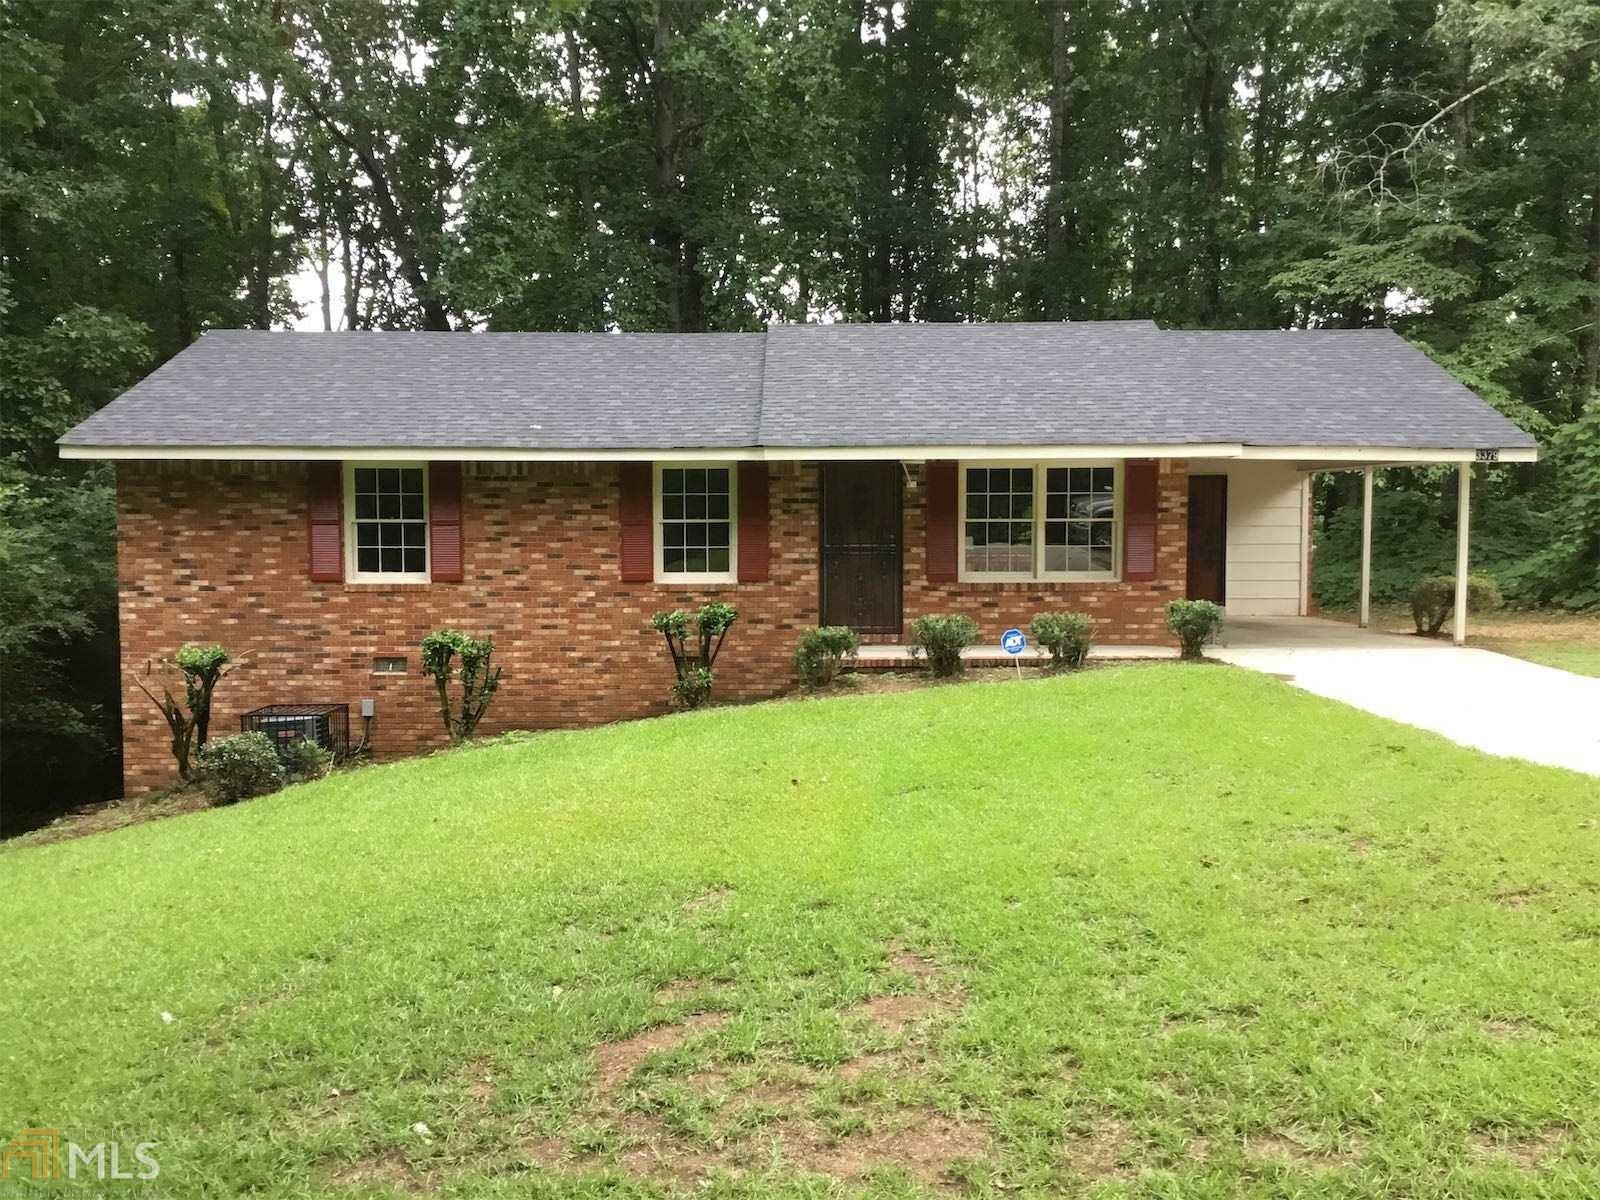 3379 Fairview Rd, Covington, GA 30016 - #: 8814816